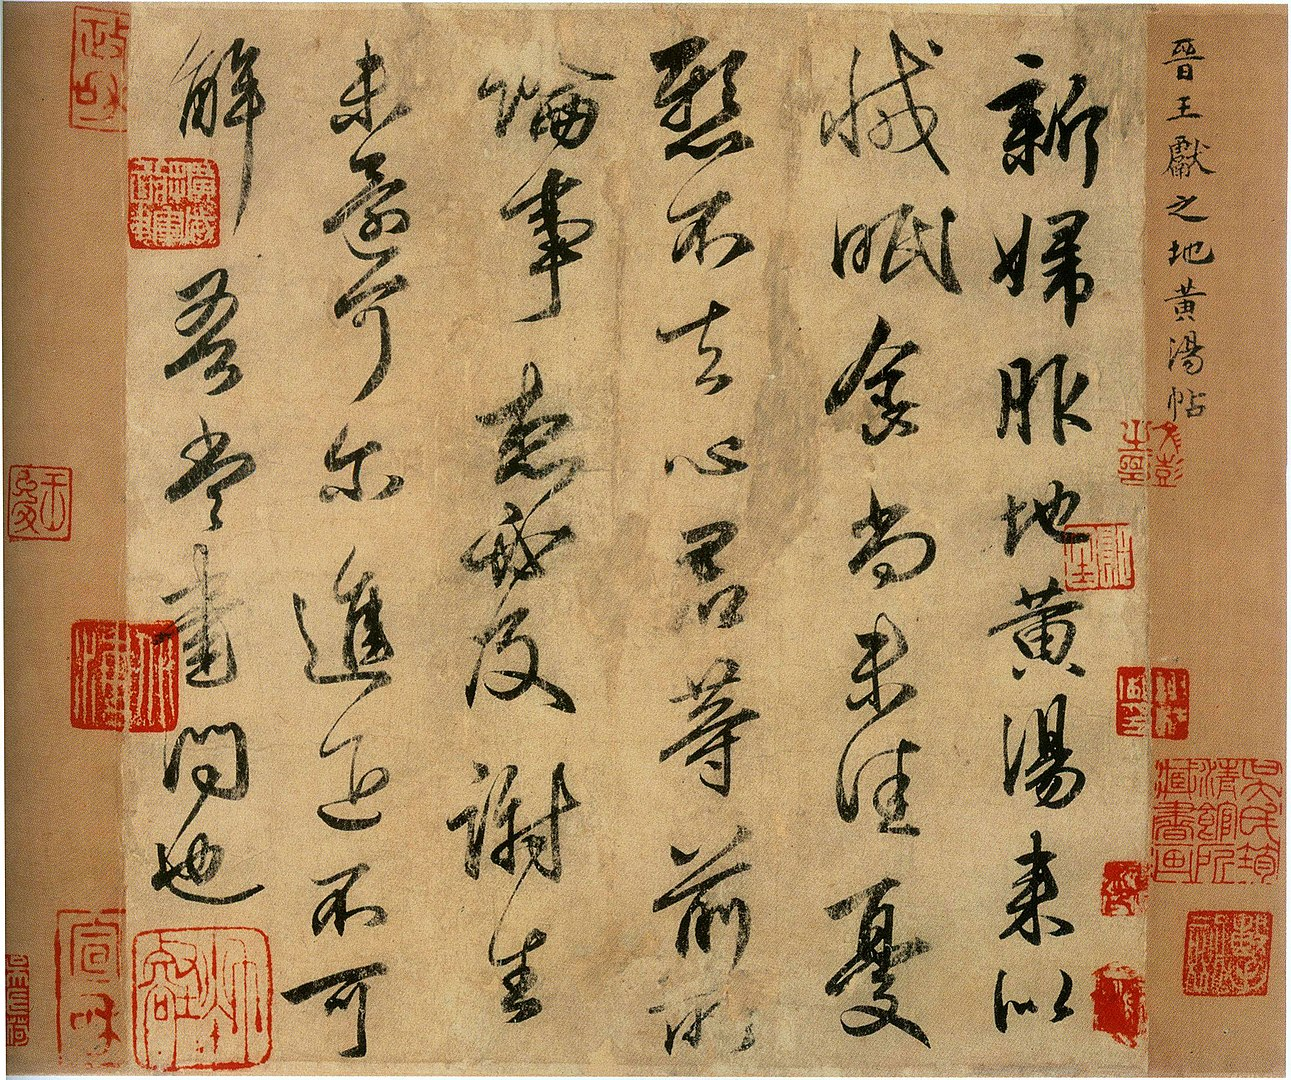 Asal-Usul Seni Kaligrafi Tiongkok (Chinese Calligraphy / 中国书法)